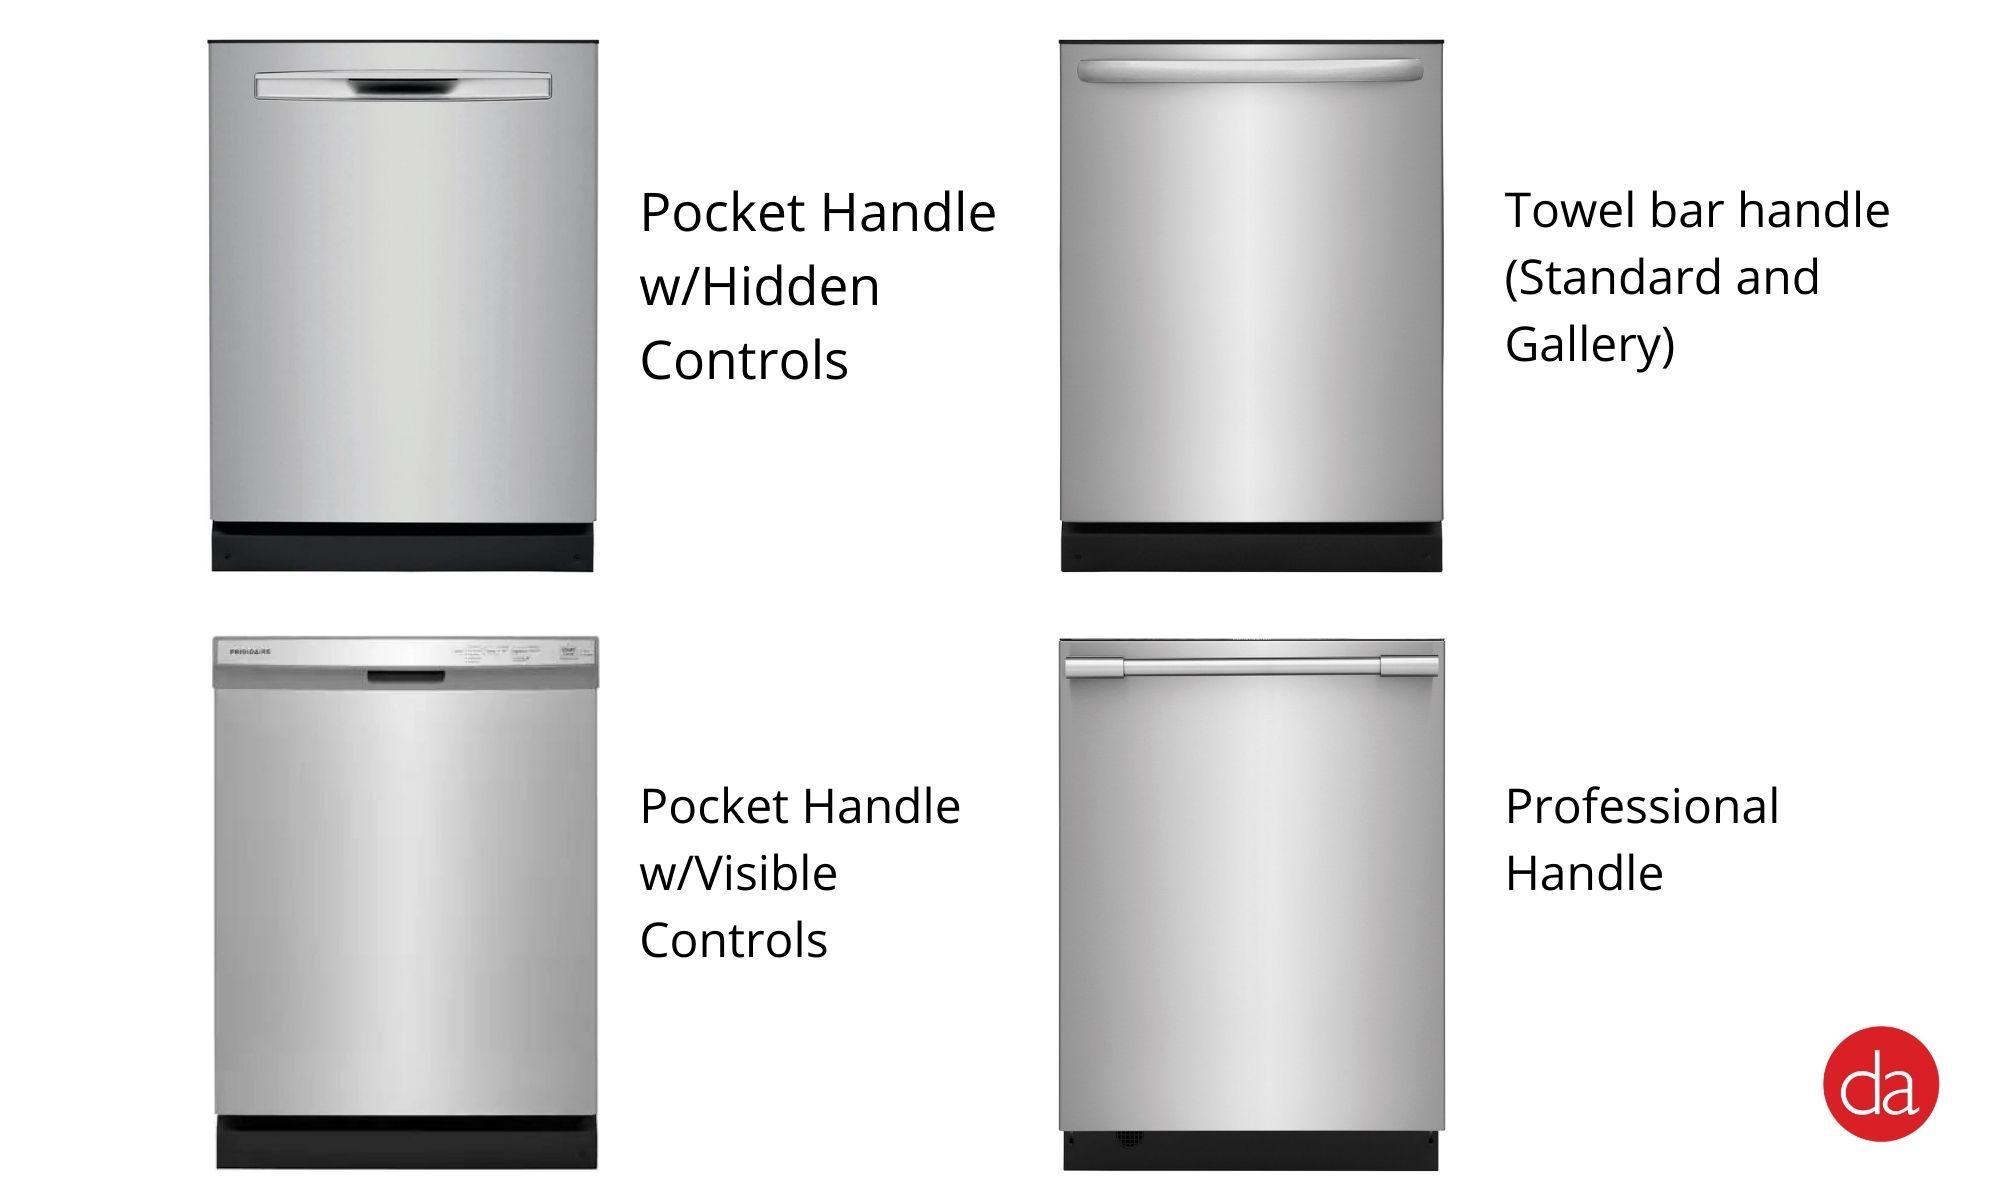 Frigidaire vs Whirlpool Dishwashers Compared [2021]